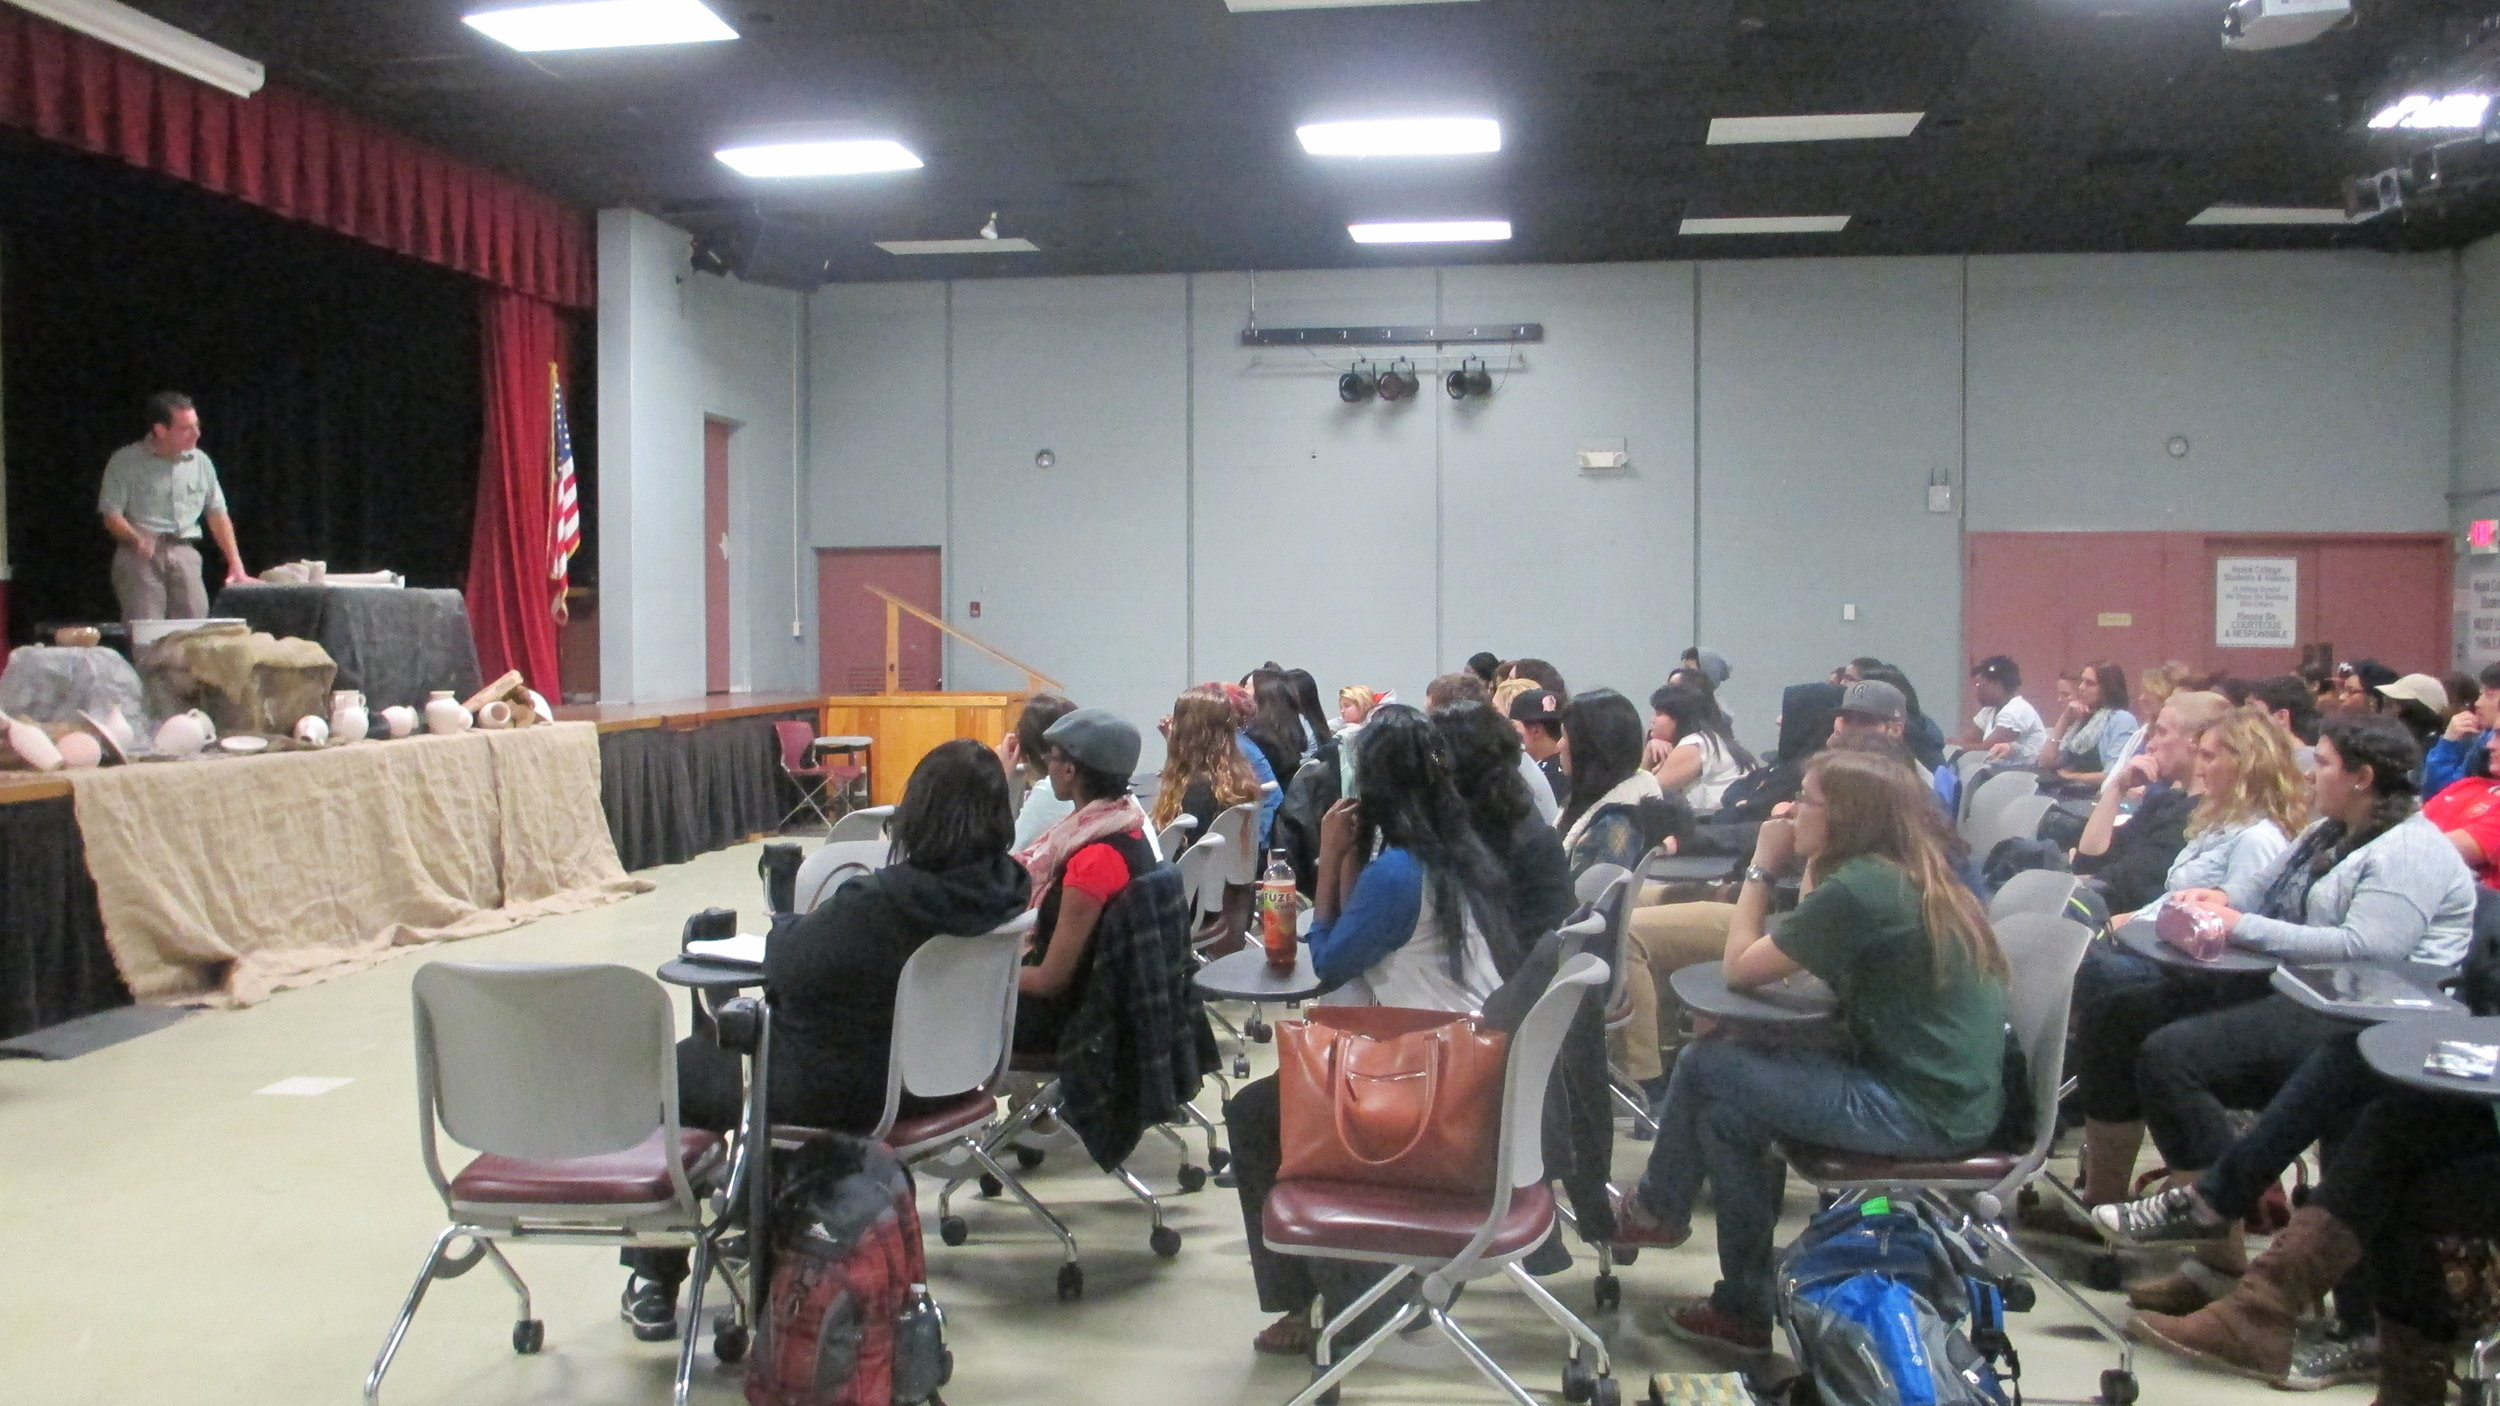 Nyack College Nov. 2013 009.JPG